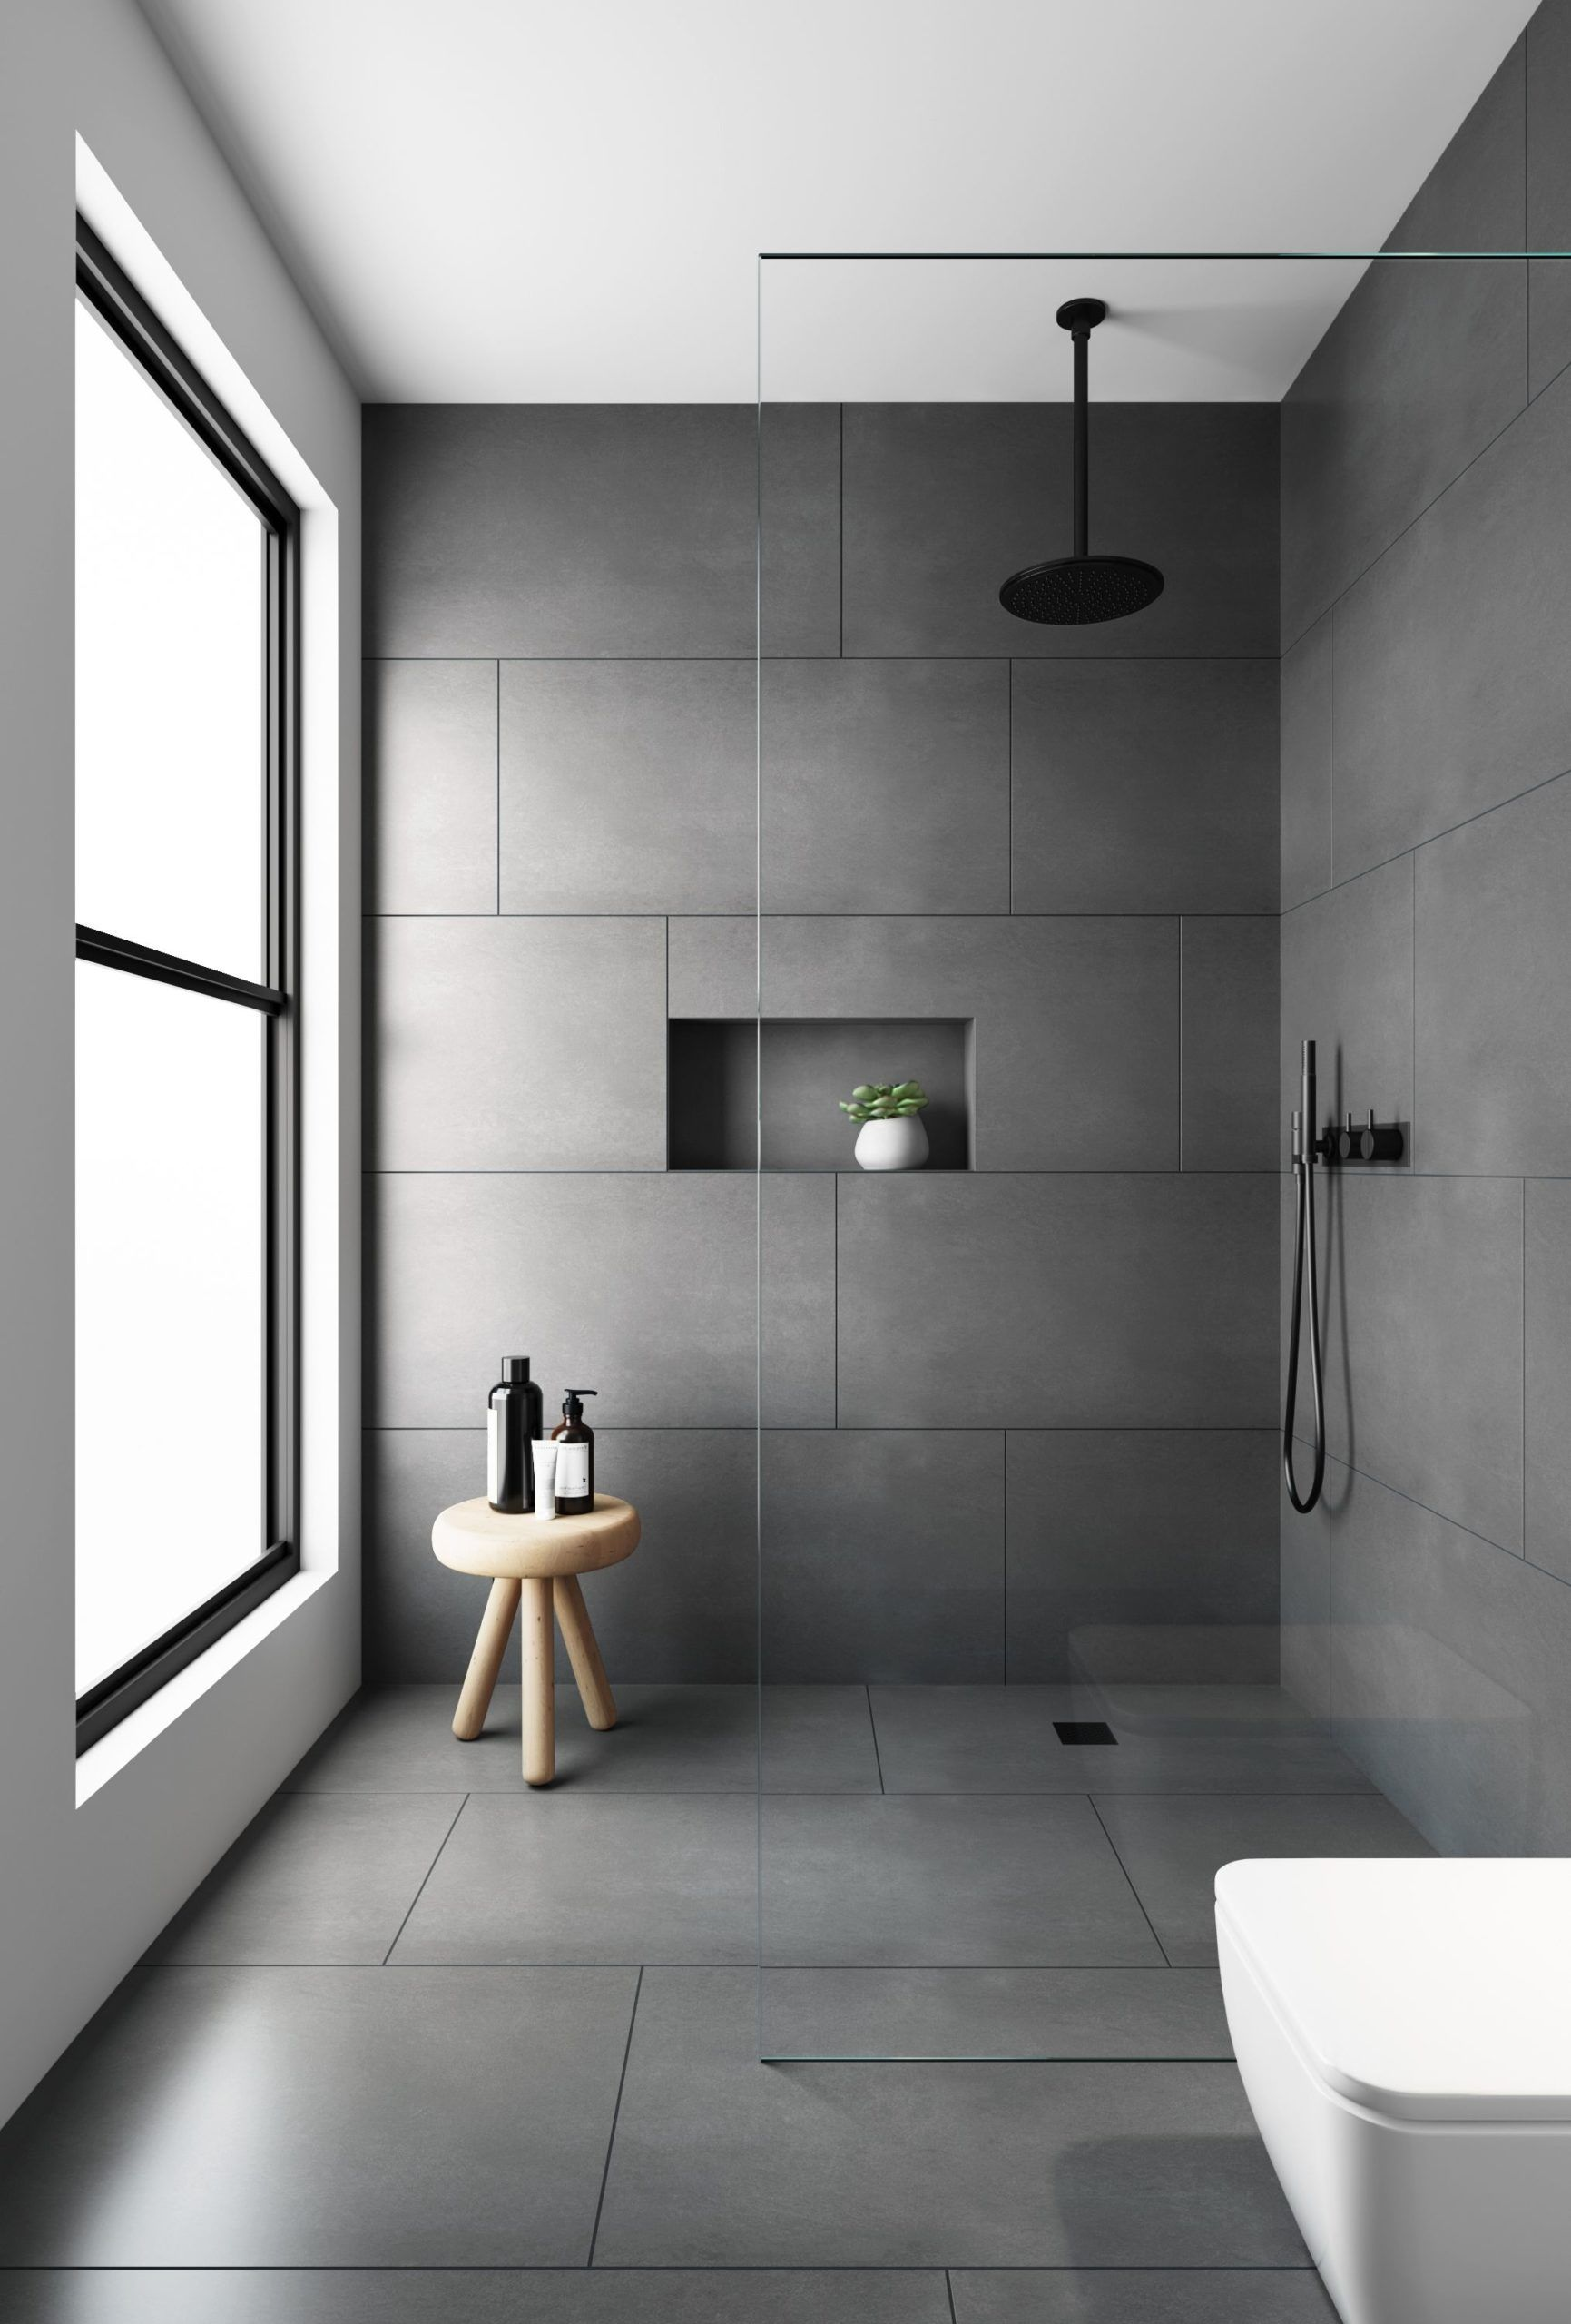 Evolution Matt Natural Grey Floor Tiles Https Diy13 Decorhousediy Com Evolution Matt Natural Grey Floor Tiles In 2020 Grey Floor Tiles Grey Bathroom Tiles